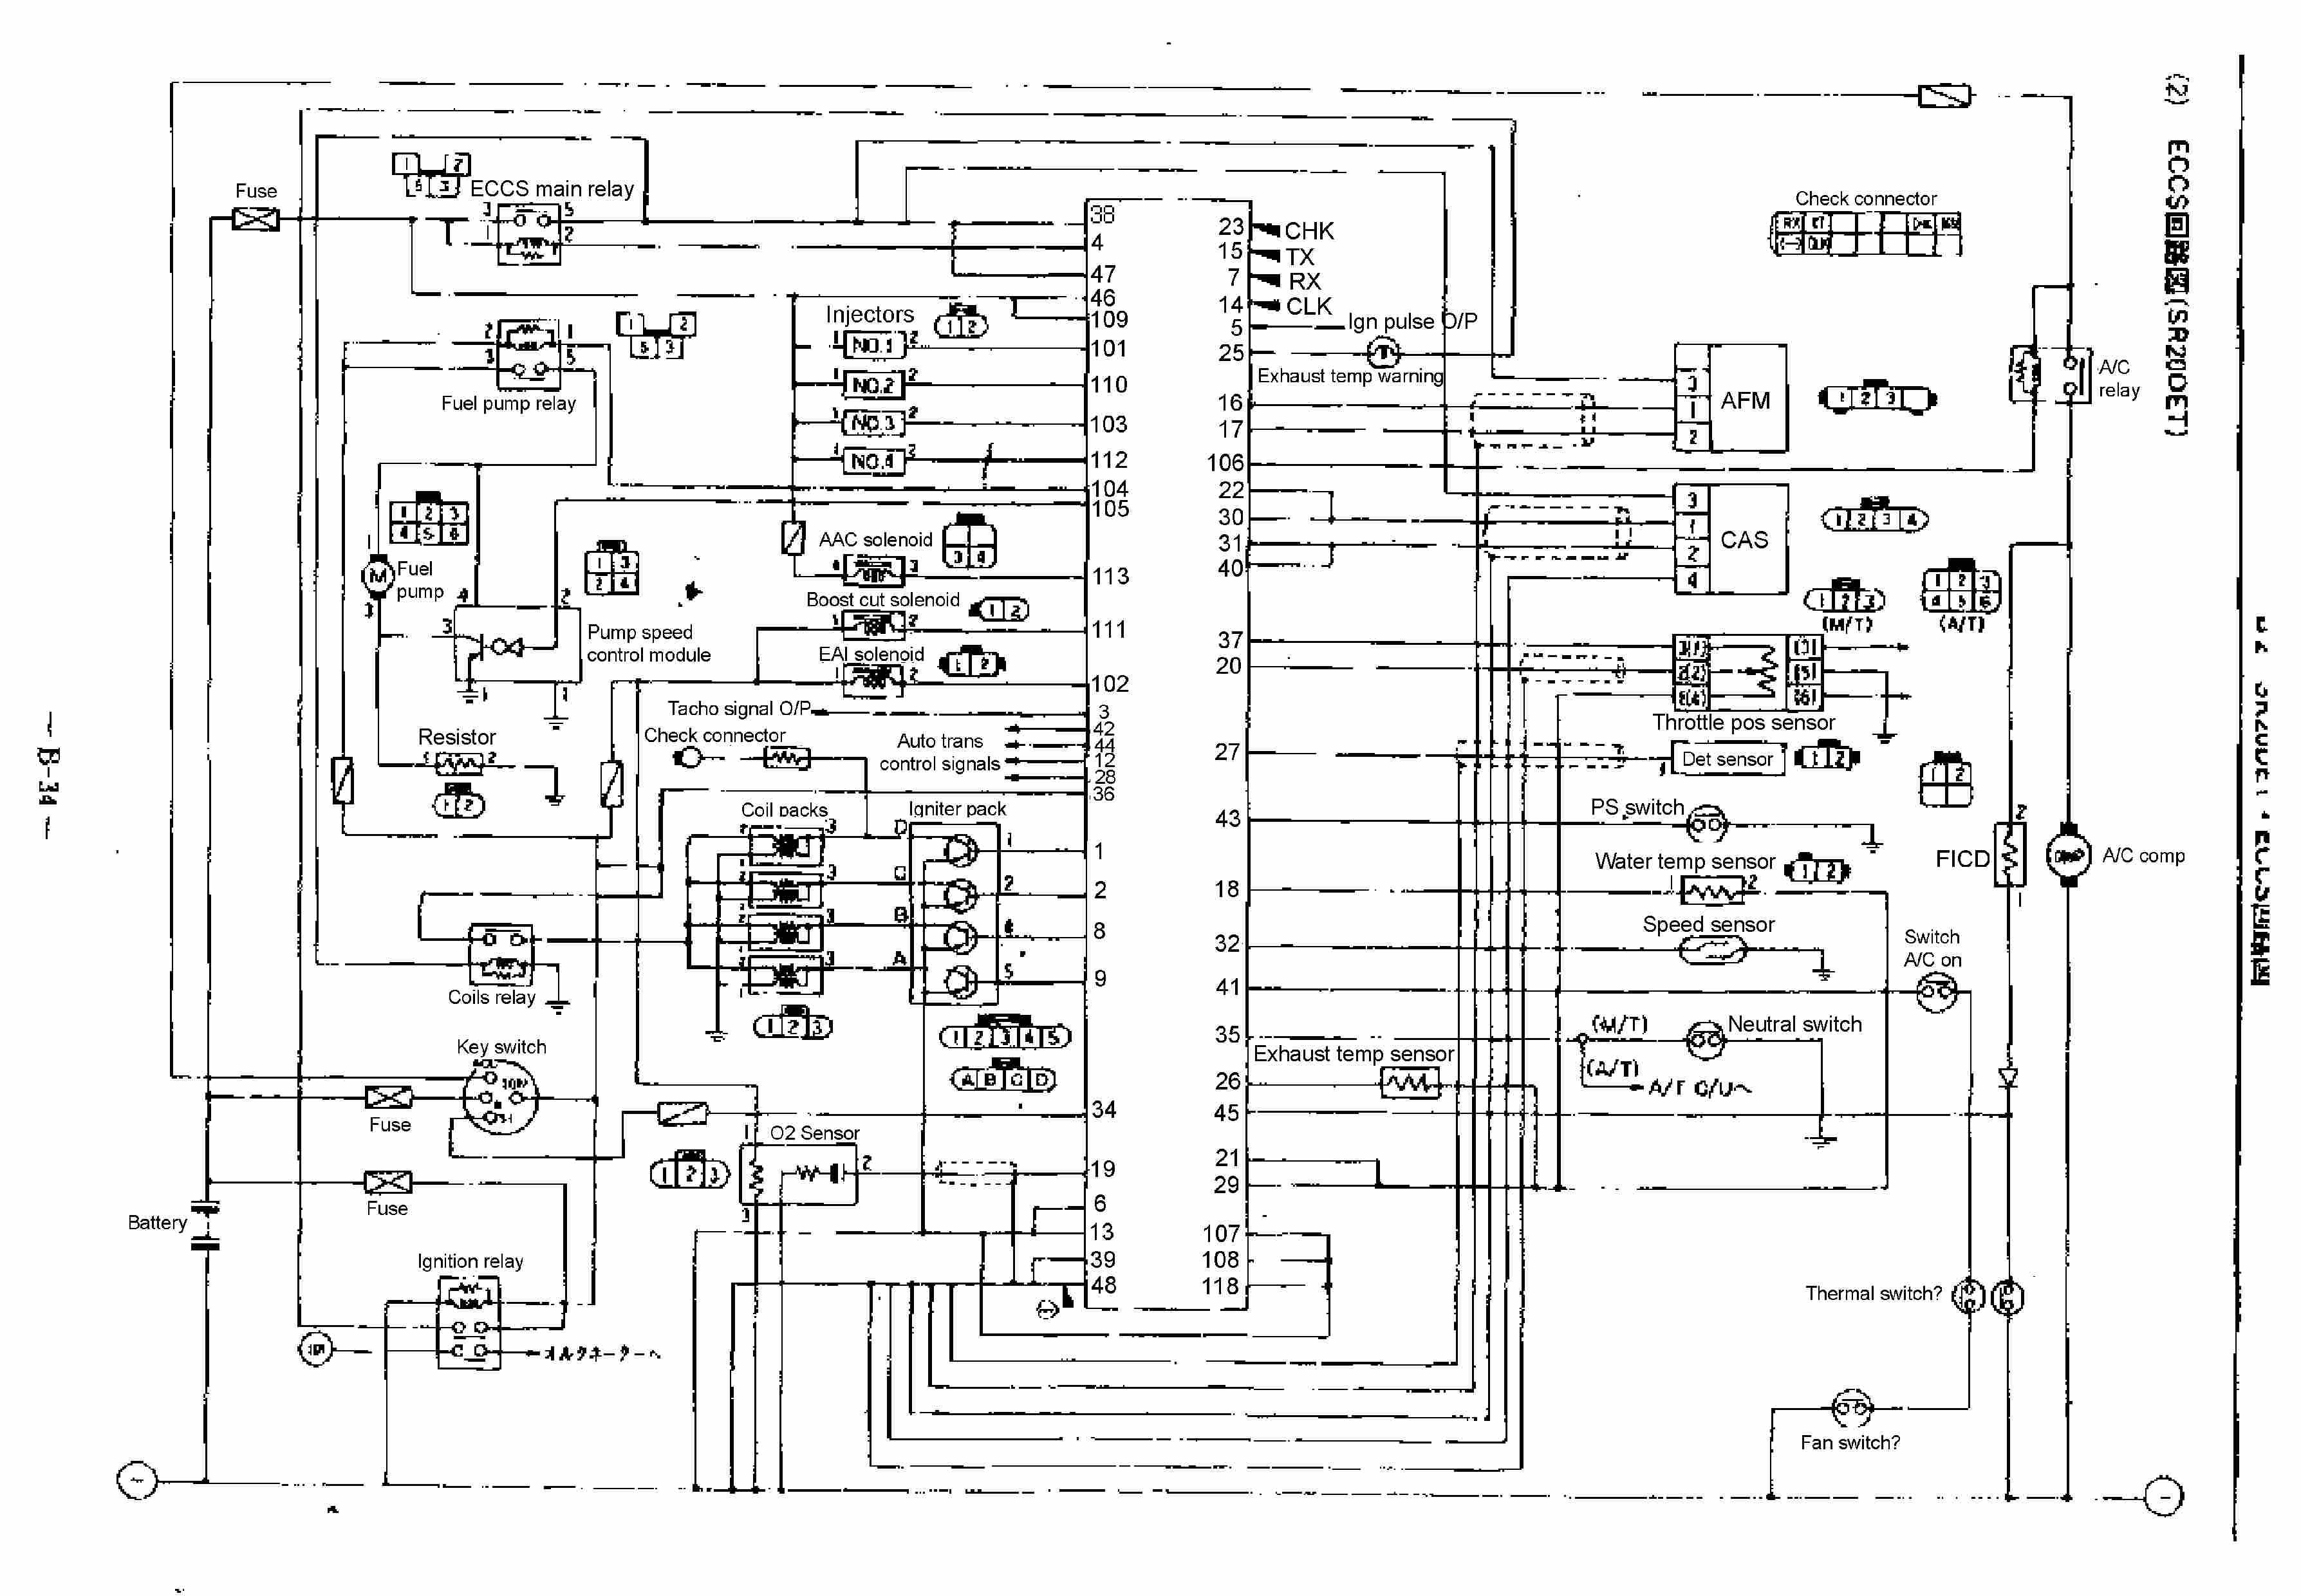 medium resolution of download nissan car manuals wiring diagrams